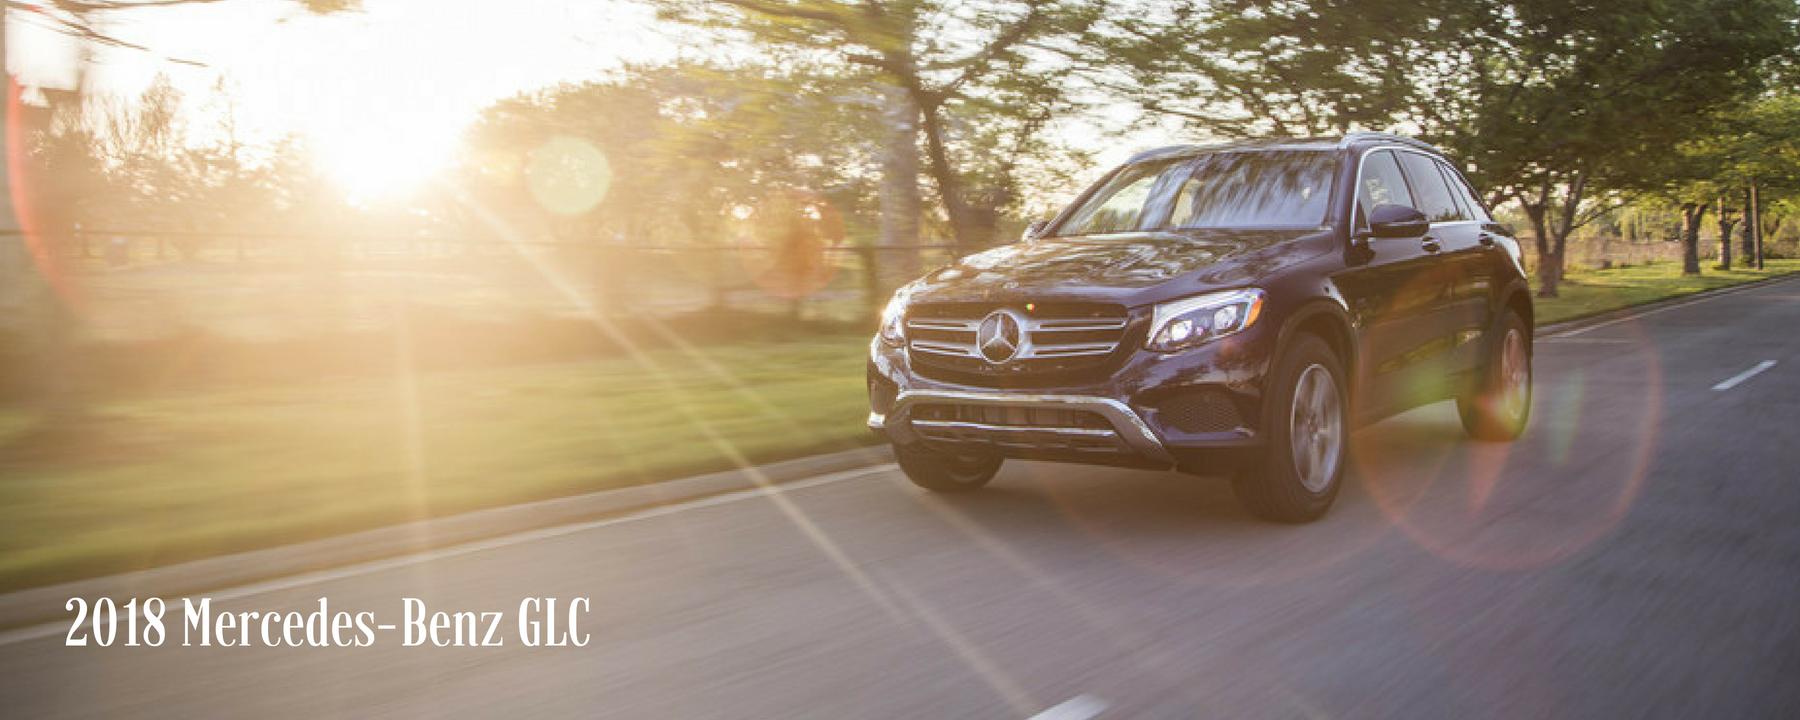 Mercedes-Benz_SUV_GLC